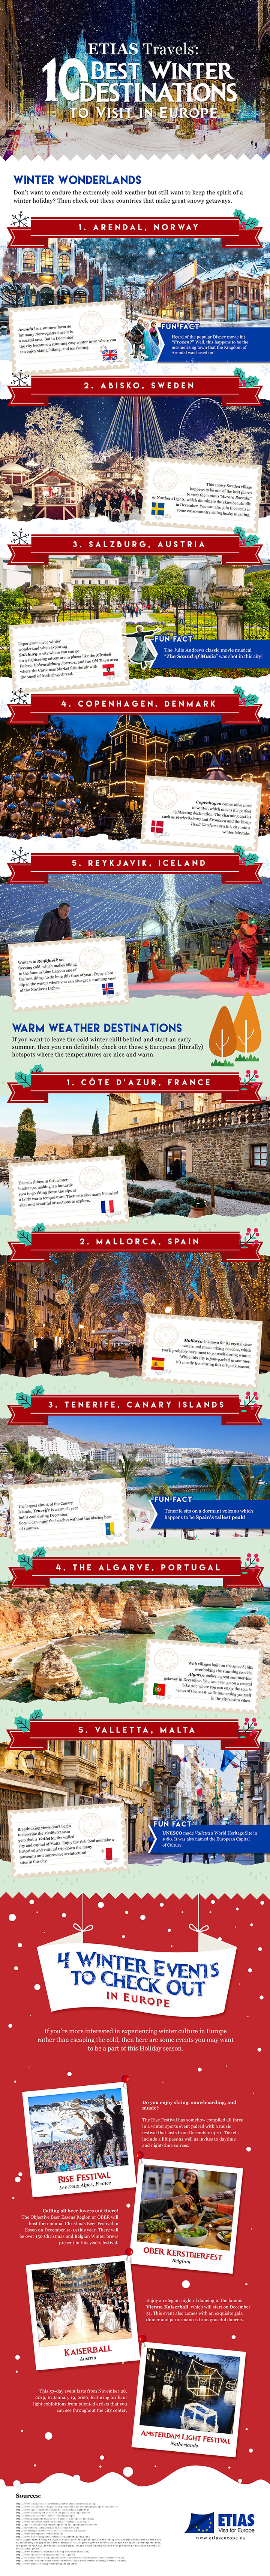 ETIAS Travels: 10 Best Winter Destinations in Europe to Visit